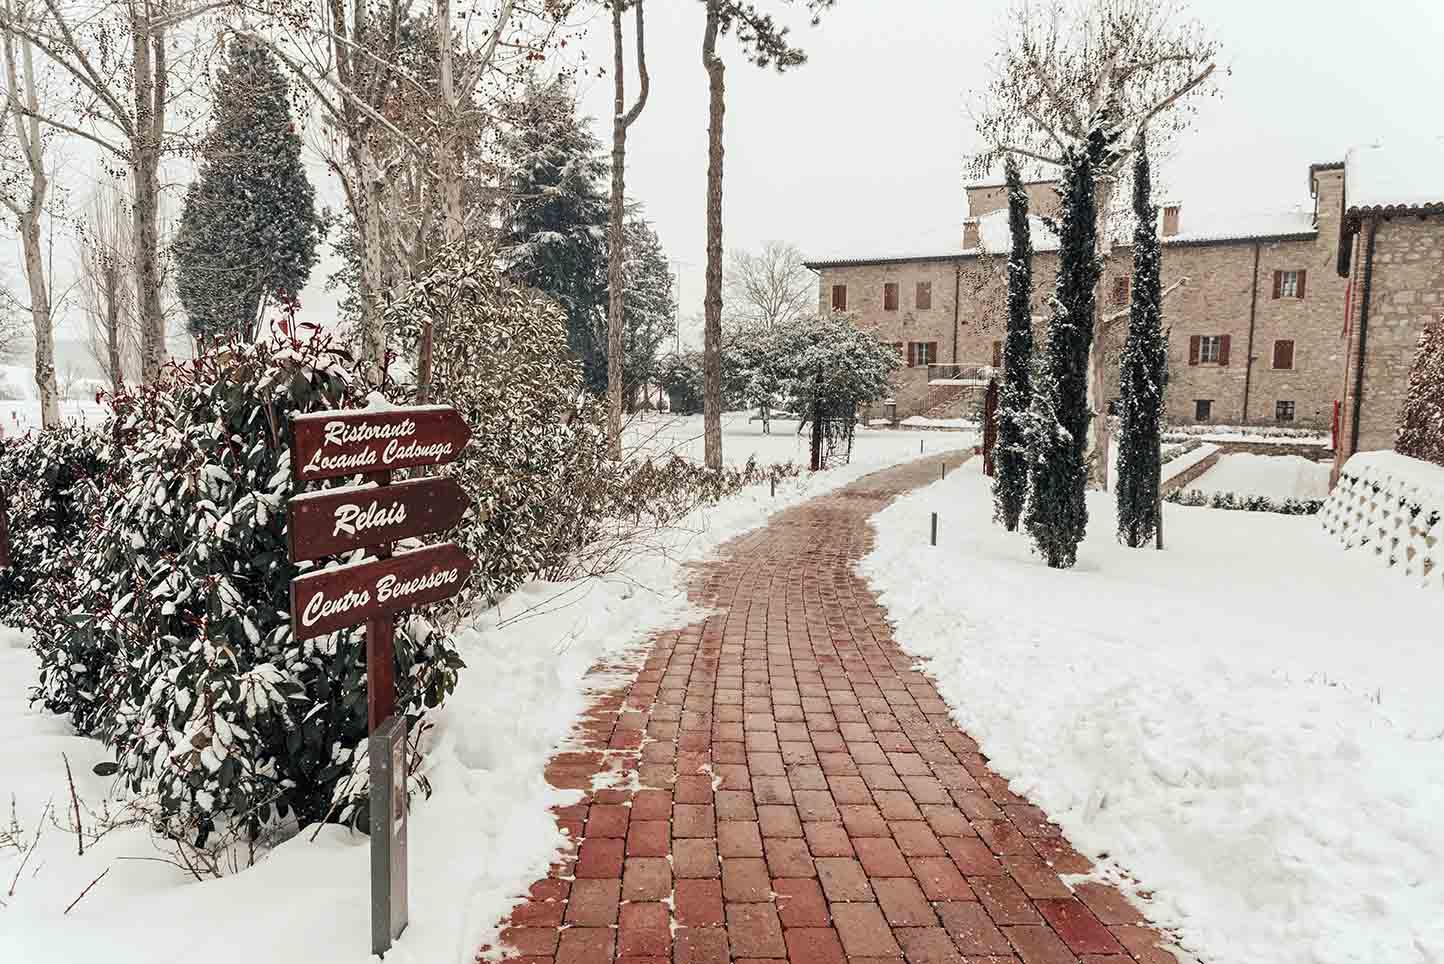 Borgo Cadonega viano reggio emilia